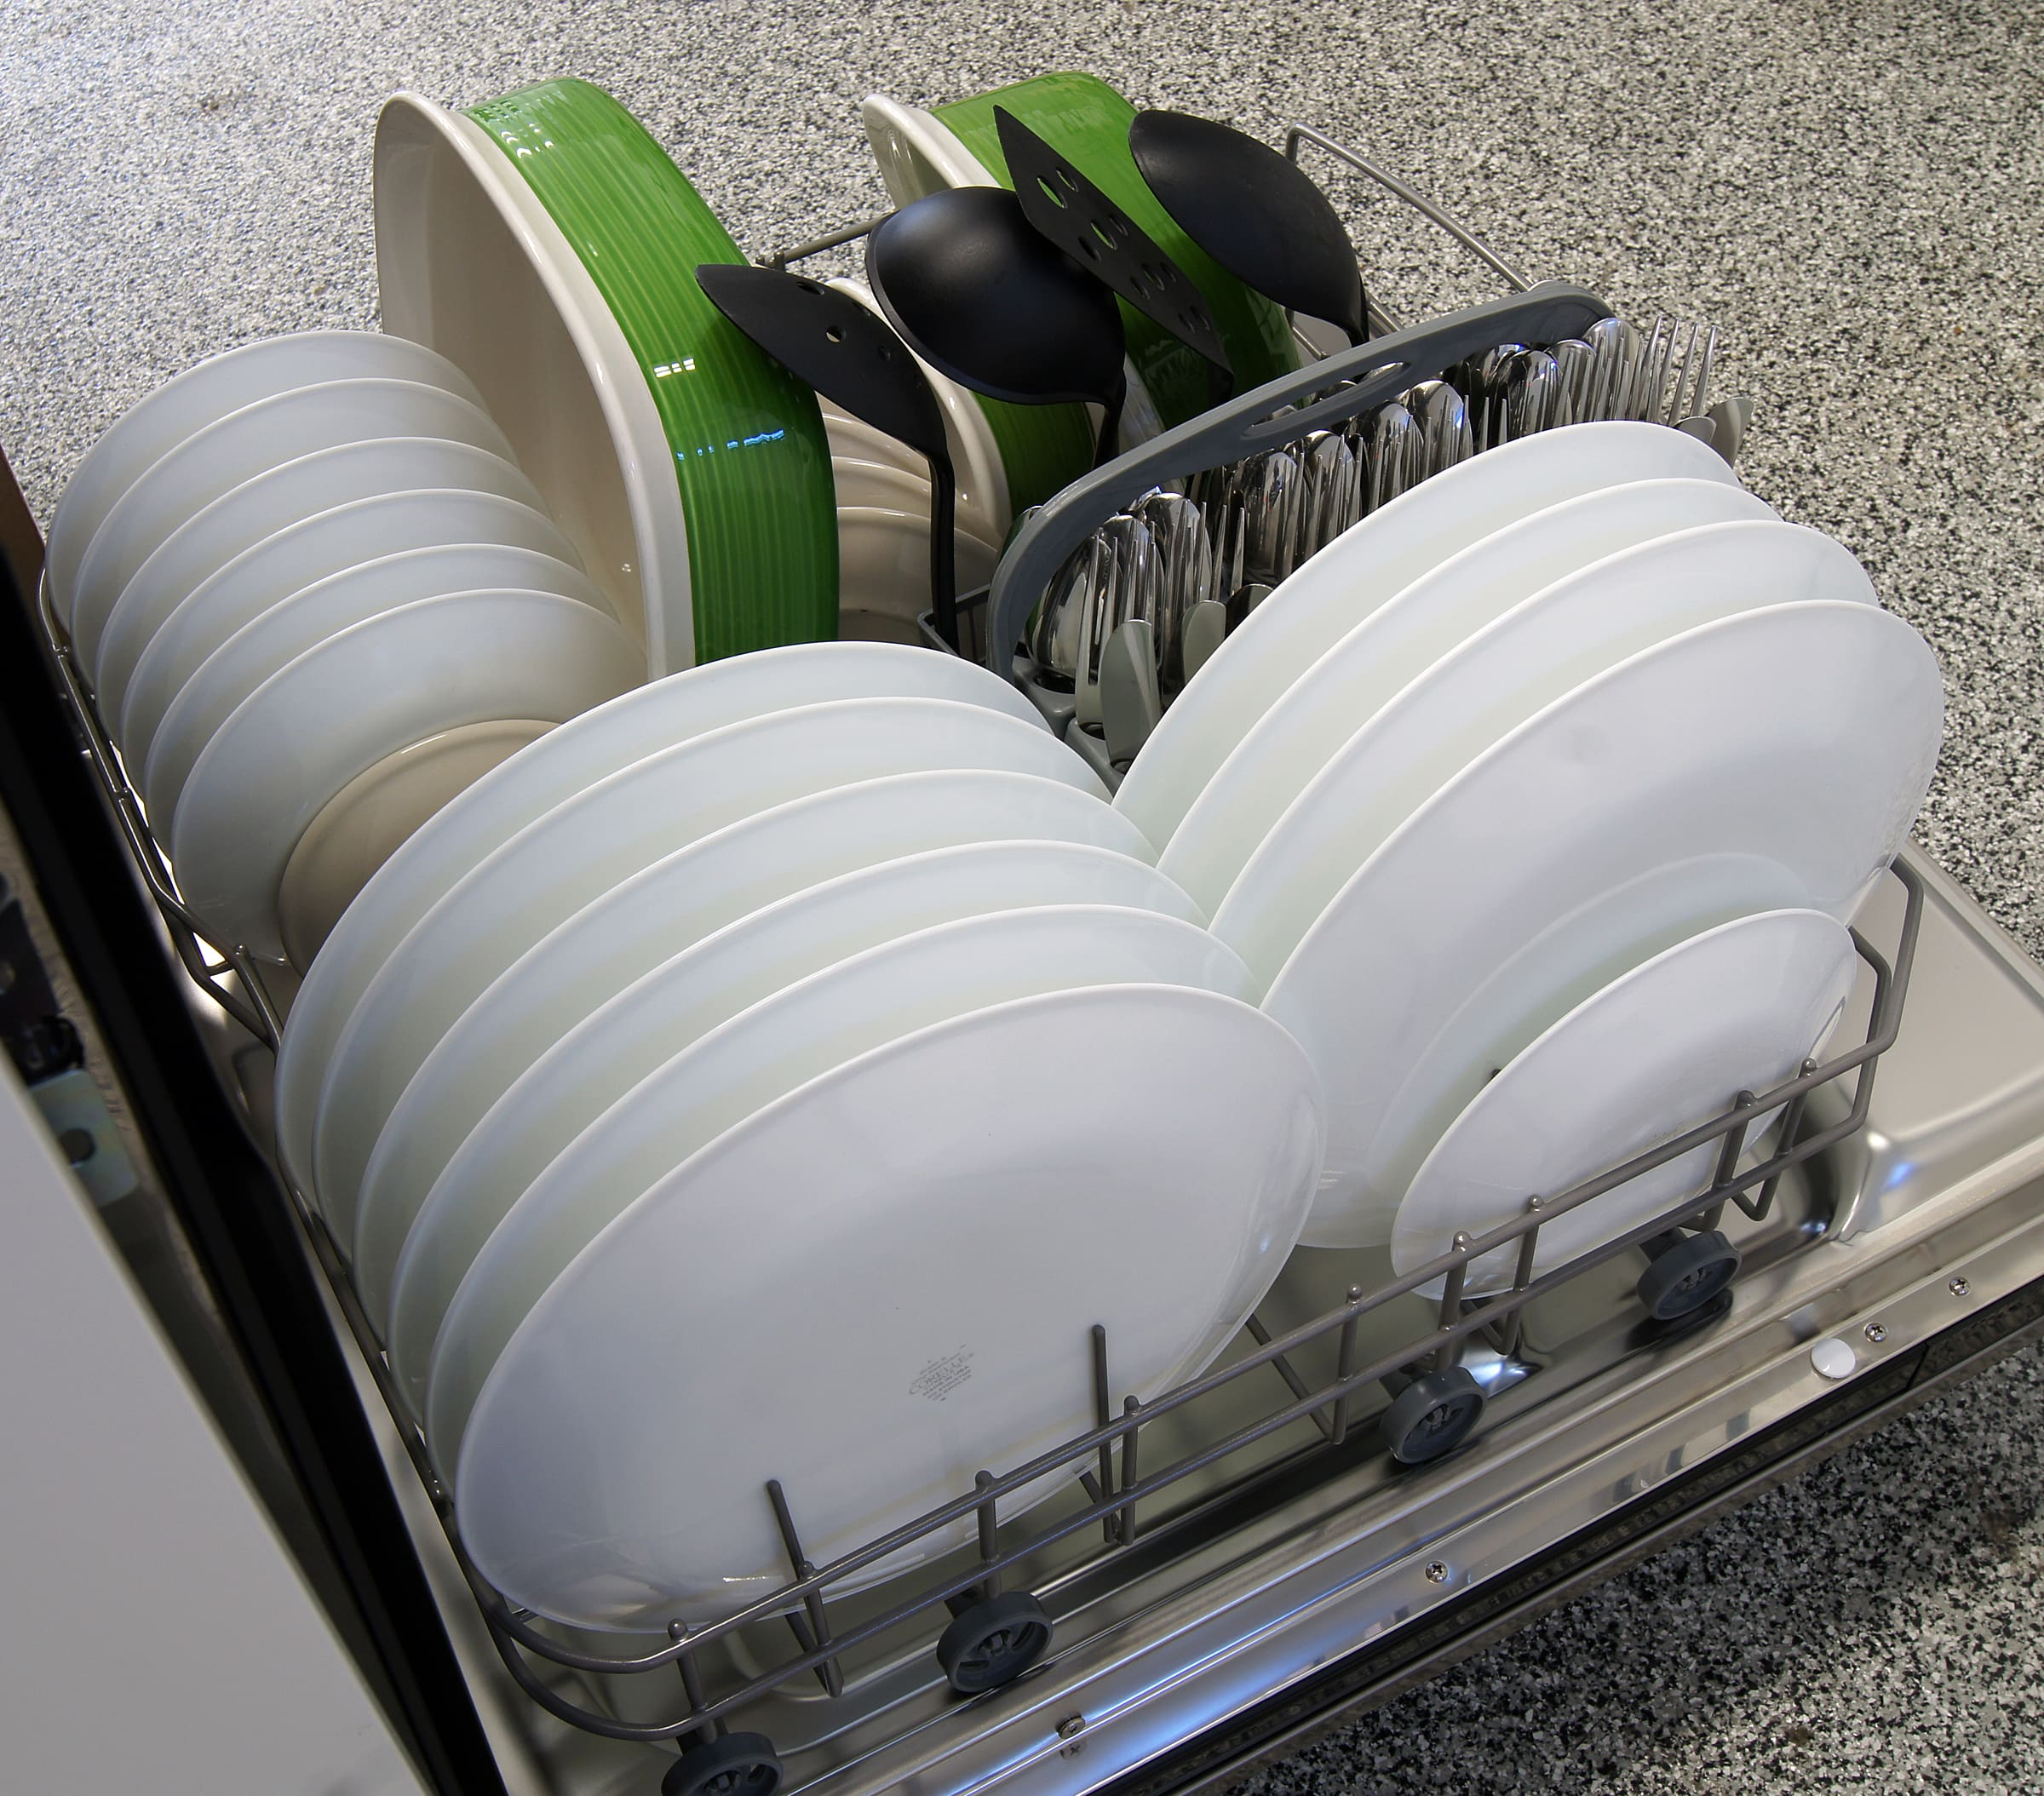 Fagor LFA-75IT bottom rack capacity